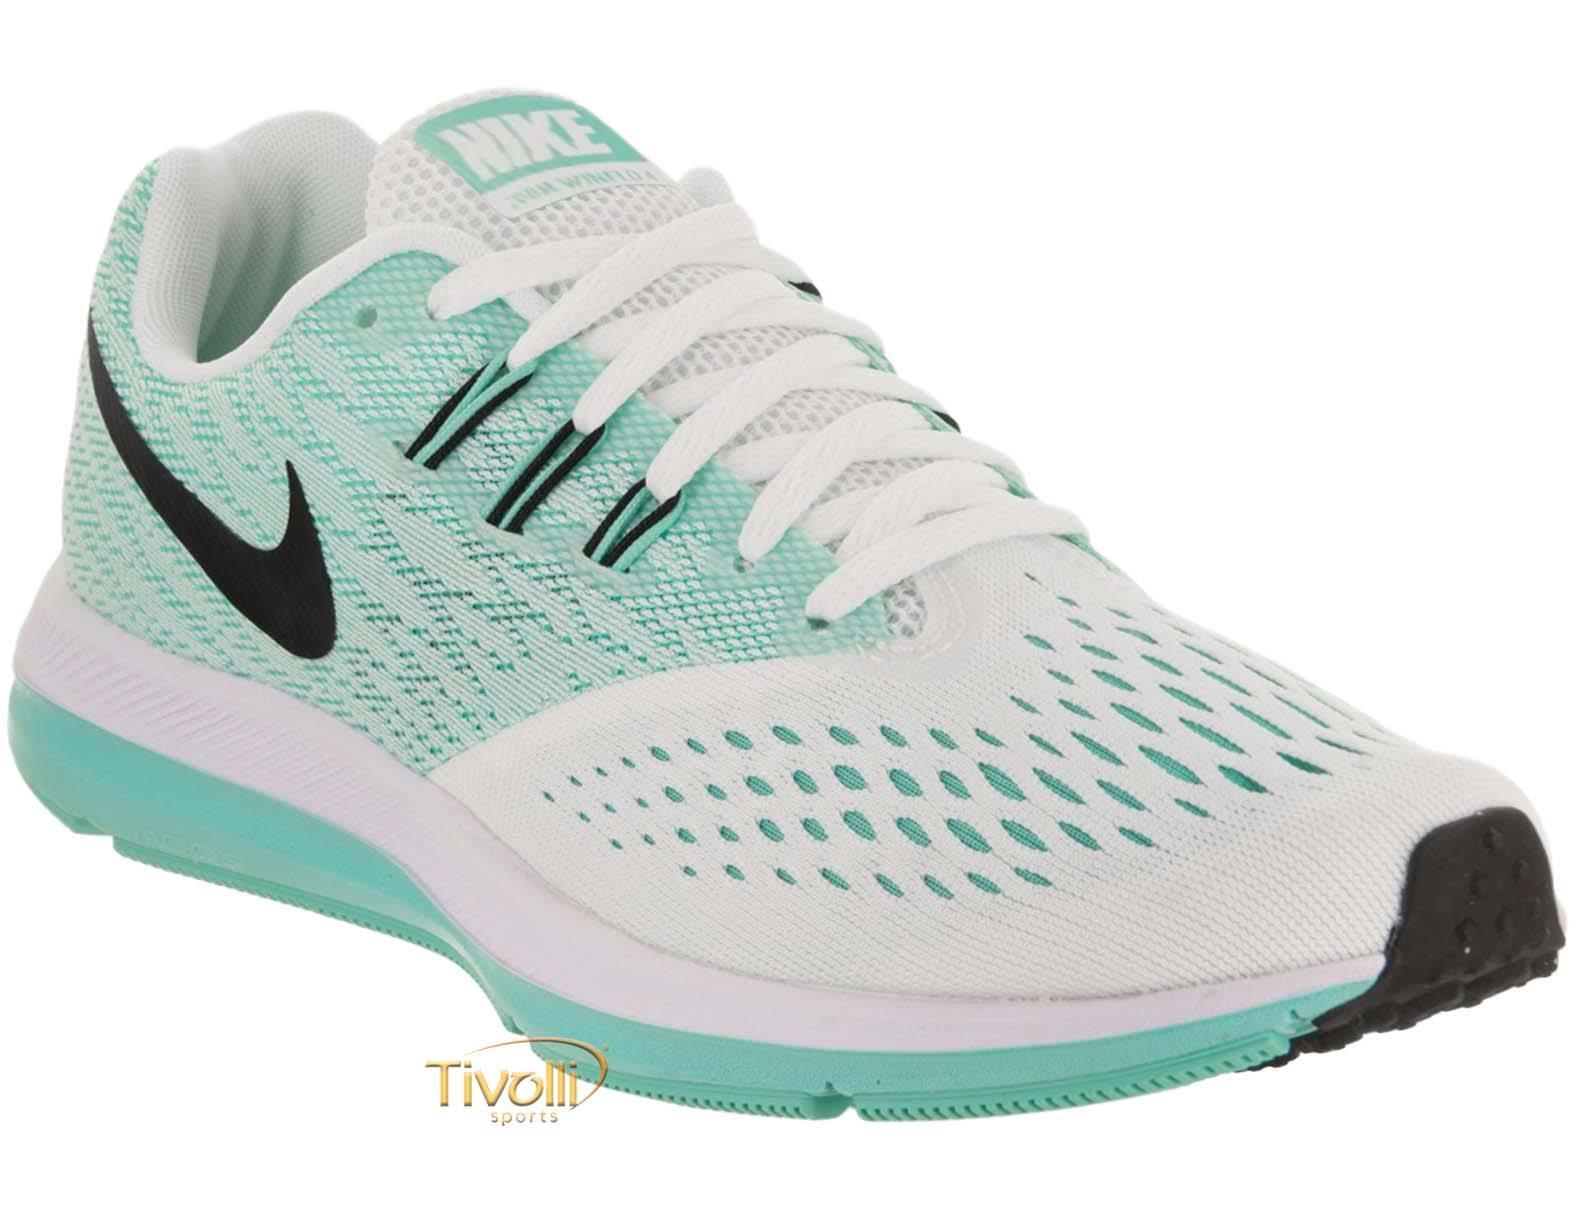 5bc2b55dcca Raquete Mania   Tênis Nike Zoom Winflo 4   Branco e Verde